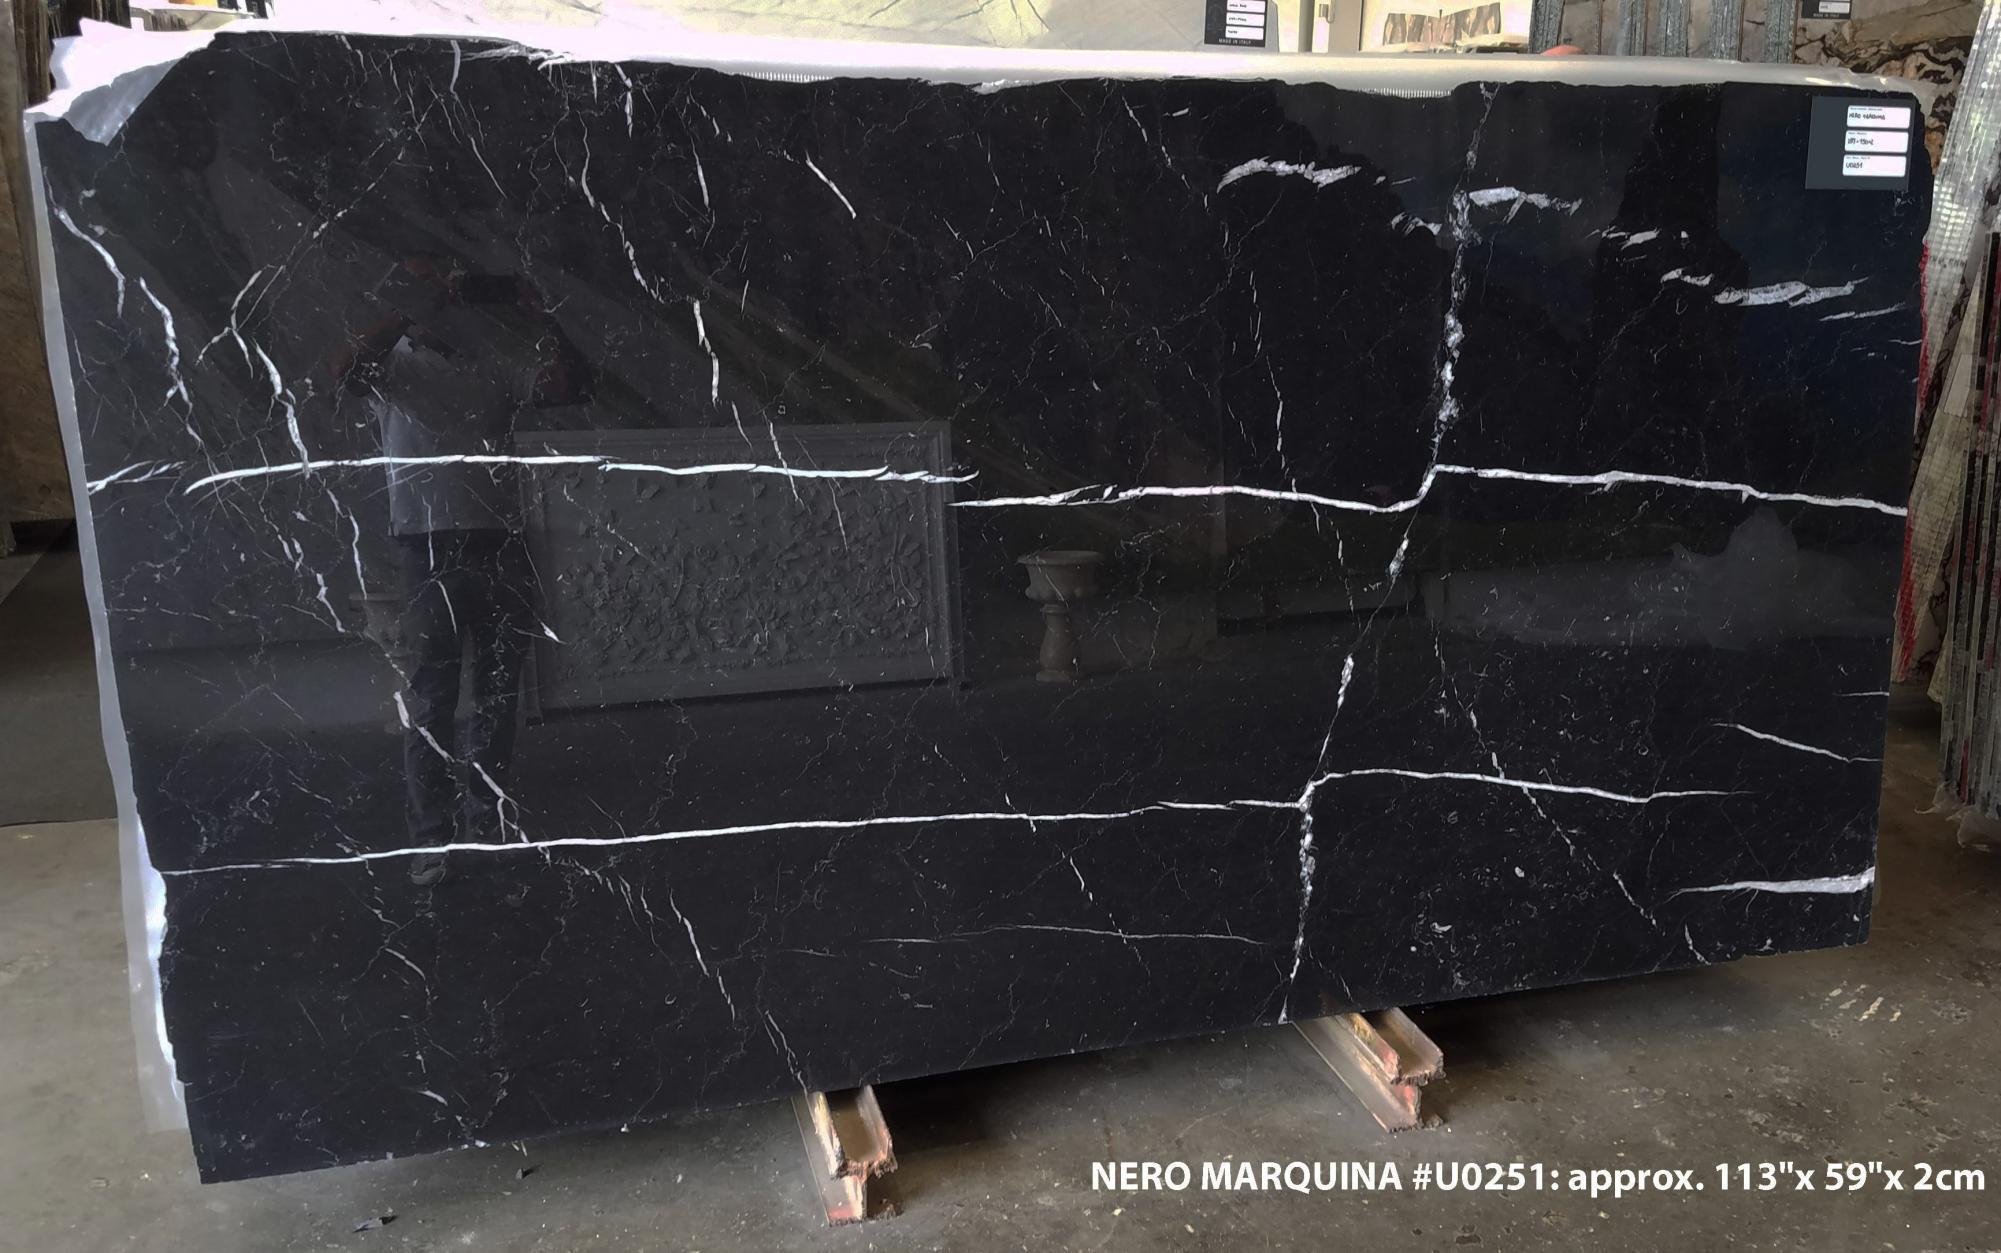 NERO MARQUINA polished slabs U0251 , SL2CM natural marble